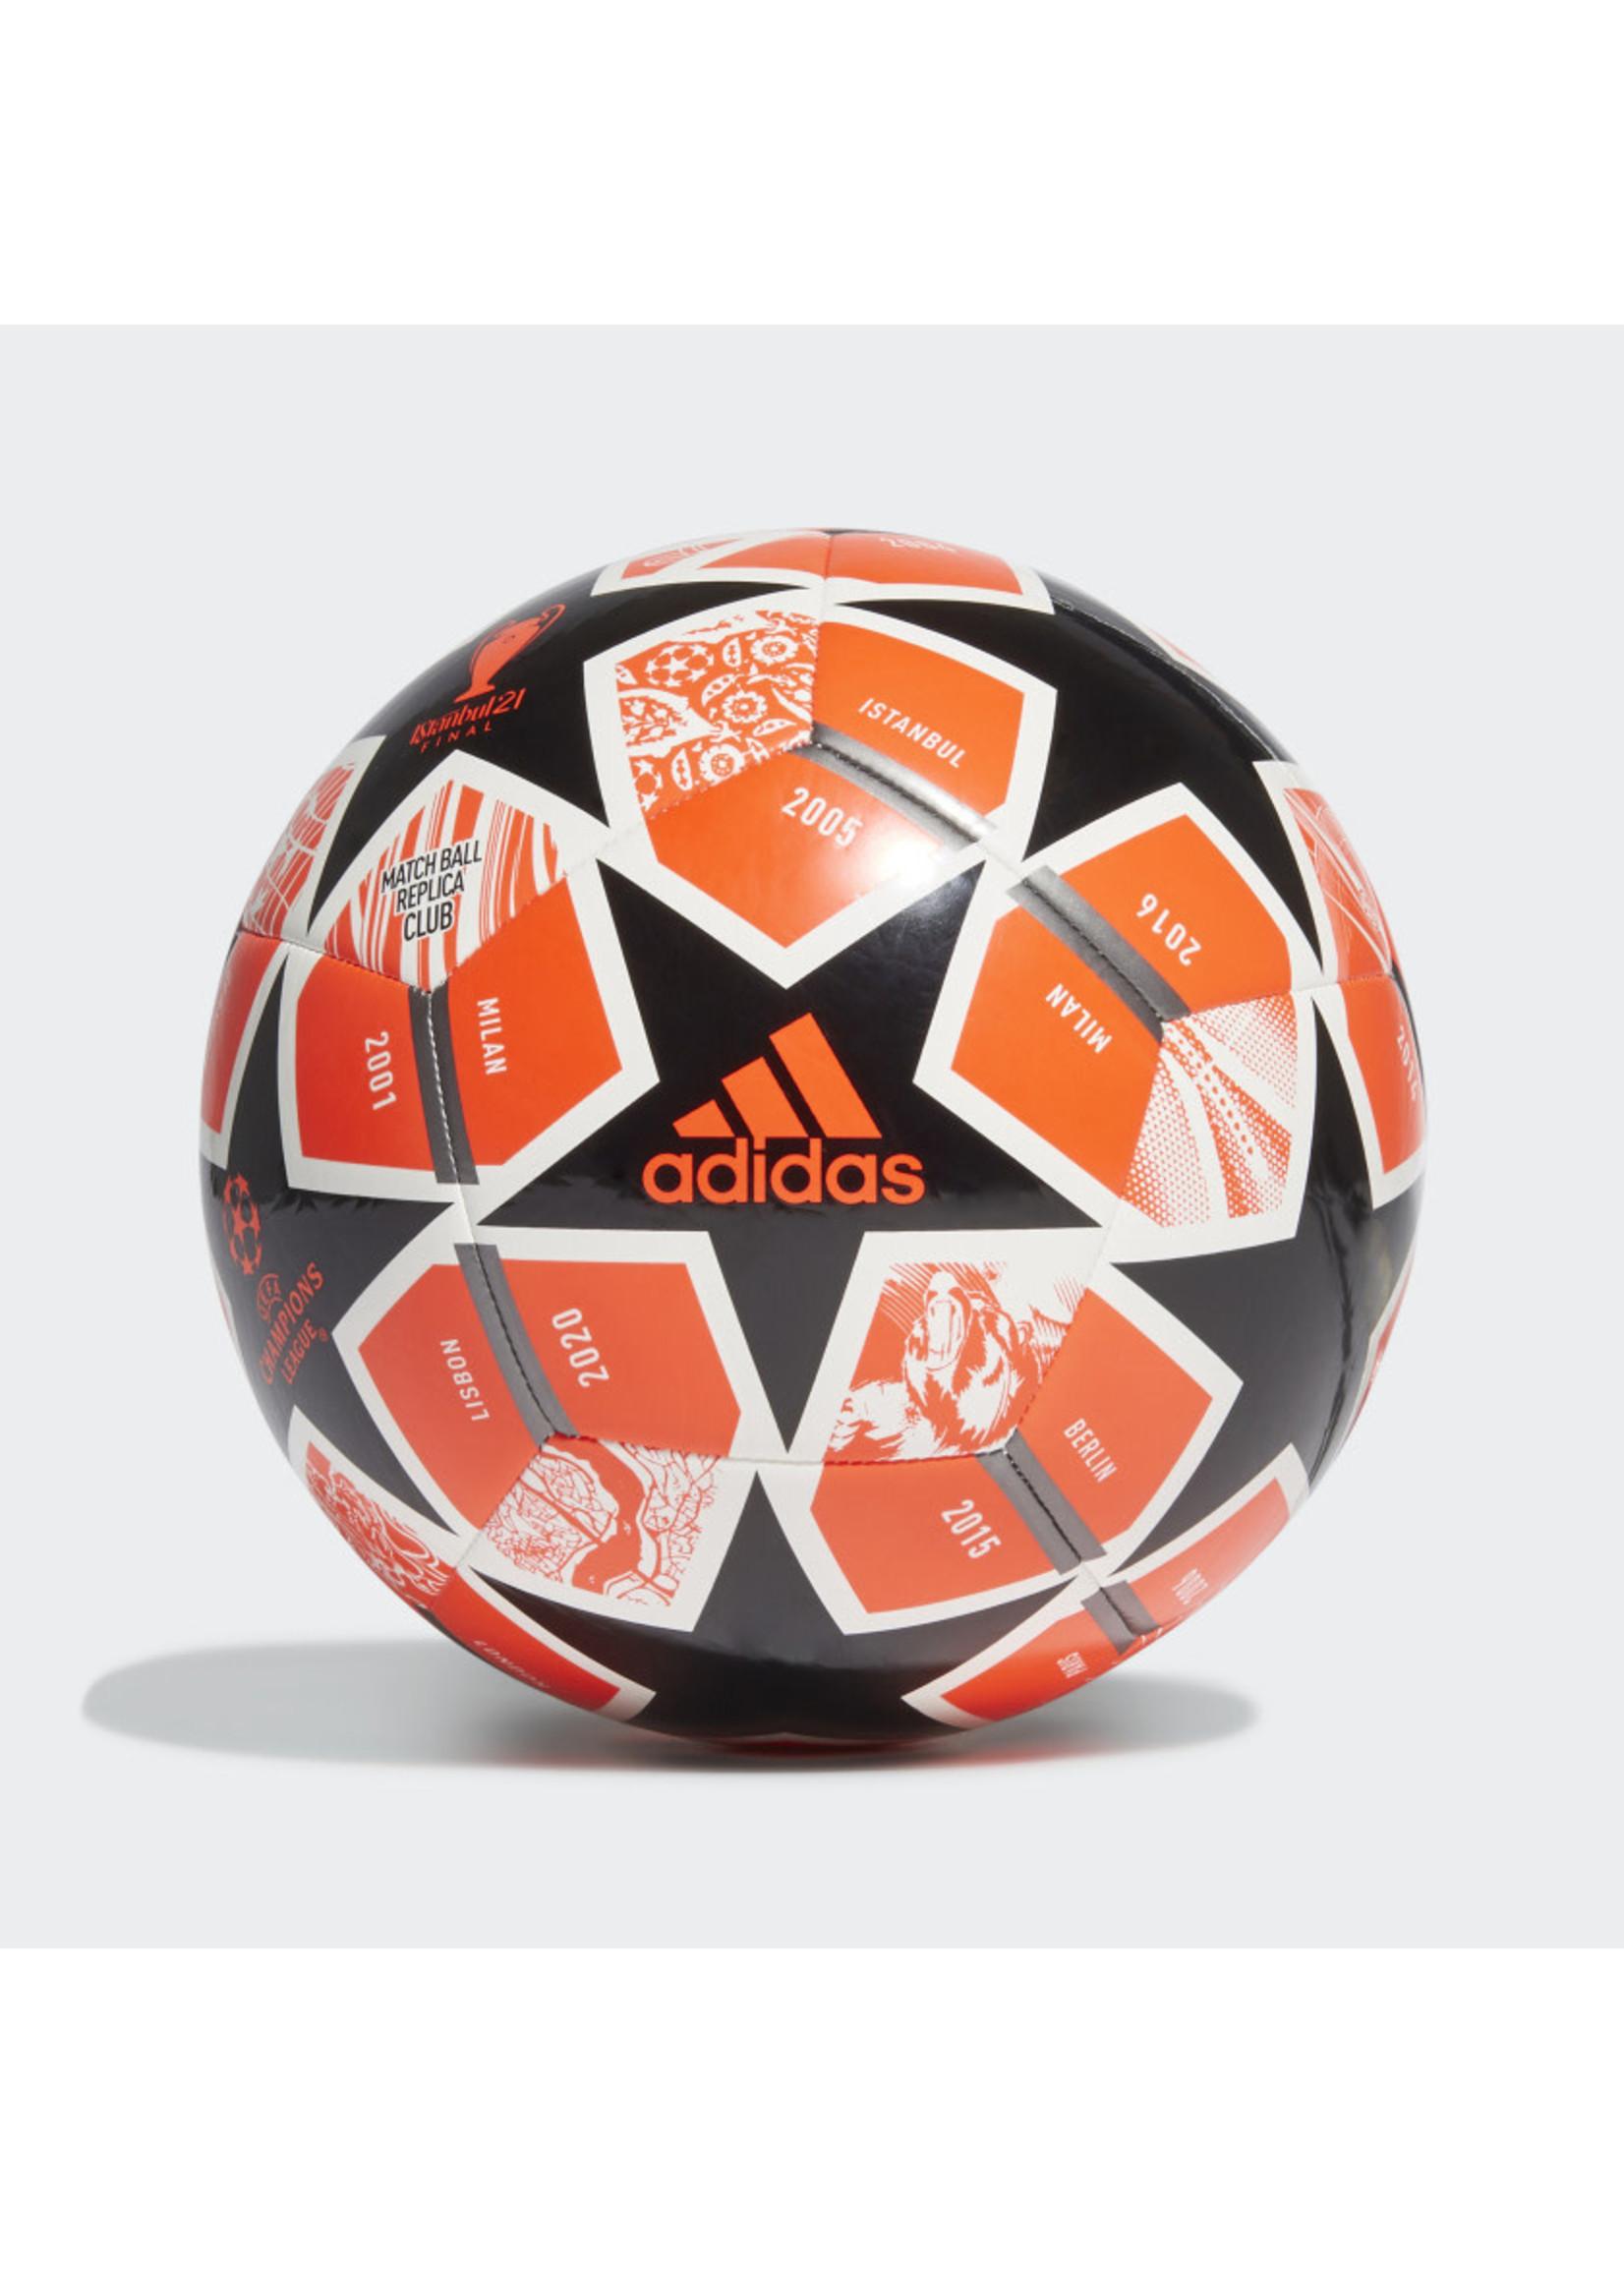 Adidas Champions League Finale Club Ball